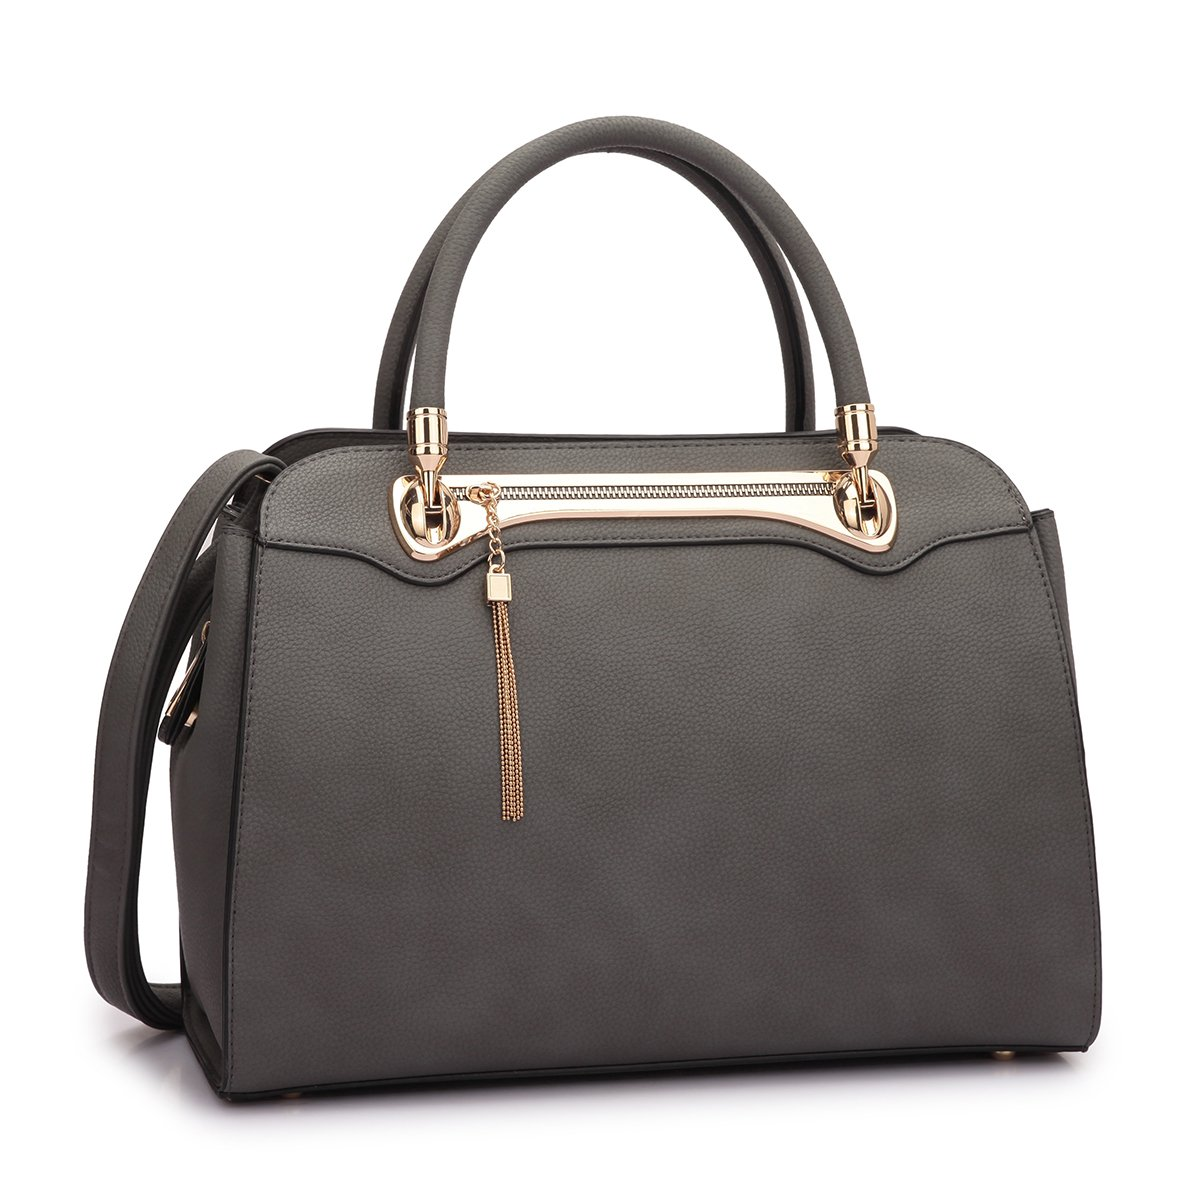 Women Structured Satchel Bags Vegan Leather Handbag Top Handle Purse Fashion Shoulder Bag with Fringed Tassel